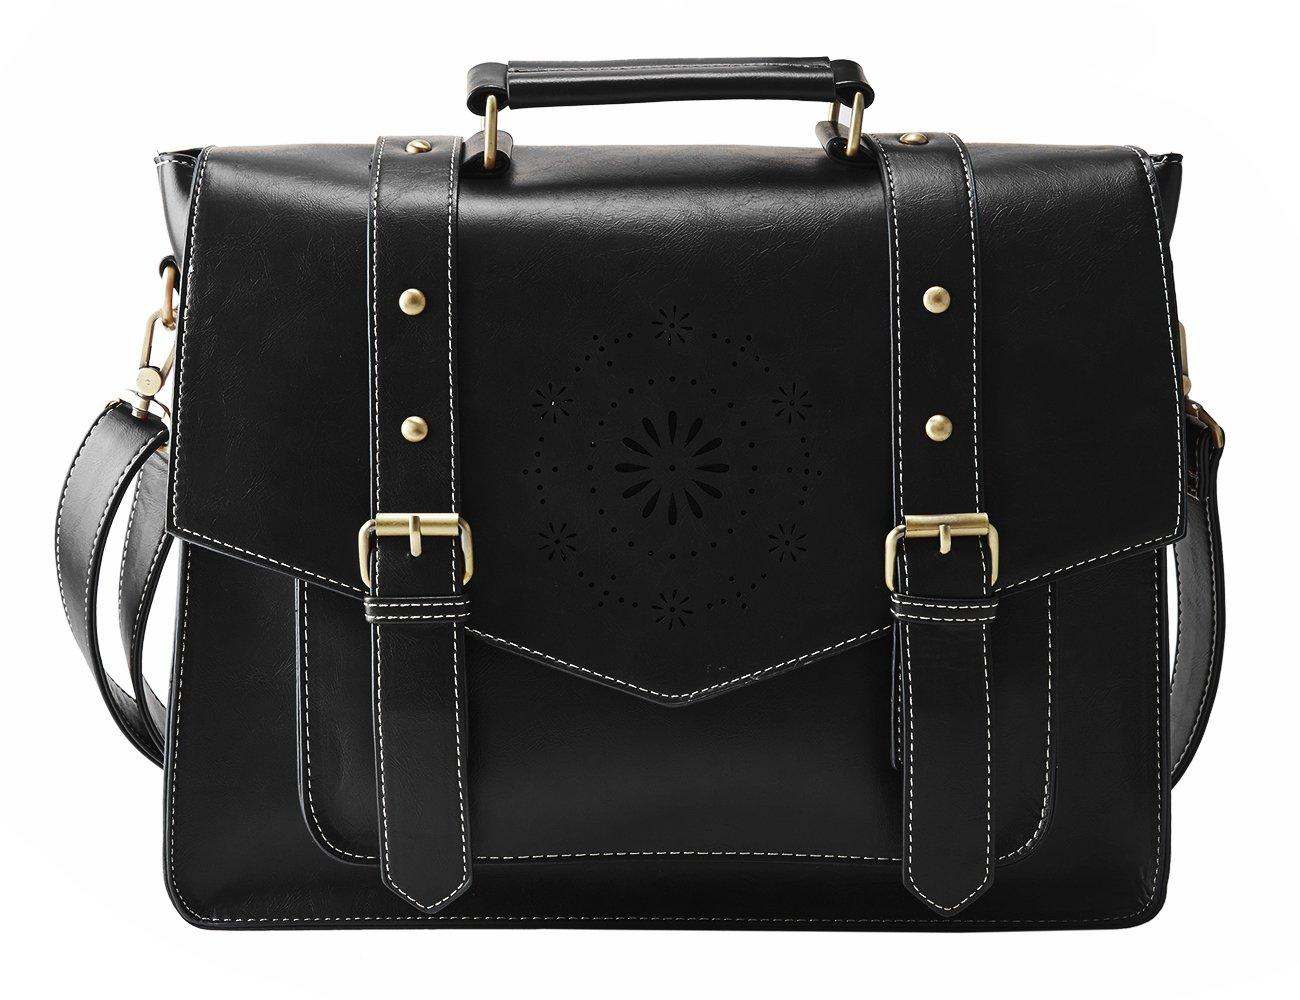 ECOSUSI Women's PU Leather Laptop Bag Tote Messenger Bag Crossbody BriefcaseFit 14'' Laptop, Black